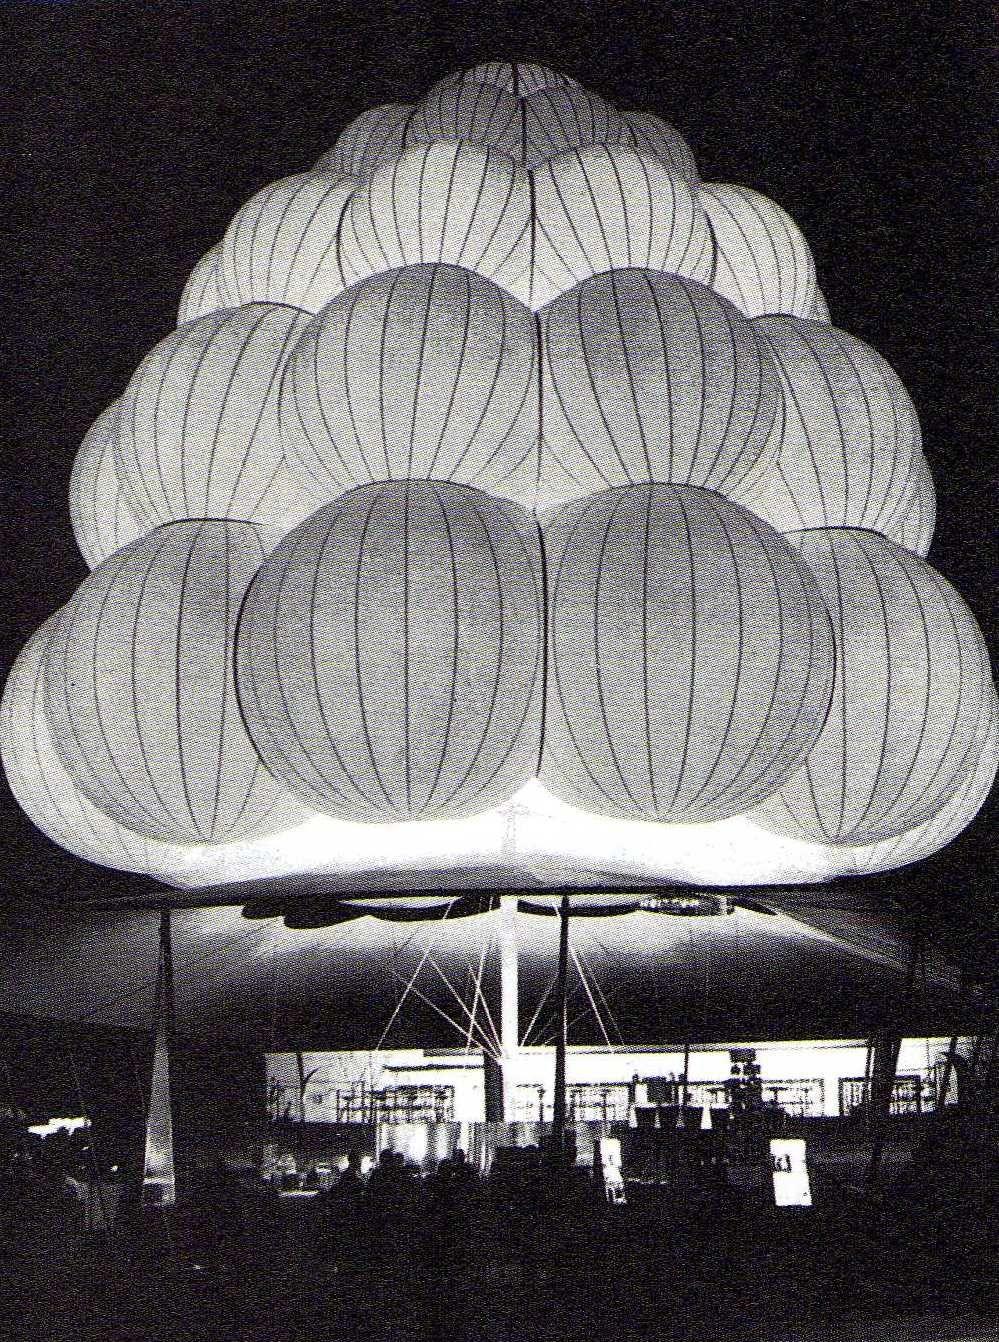 Brass Rail Snackbar, Nueva York, Feria Universal, 1964.